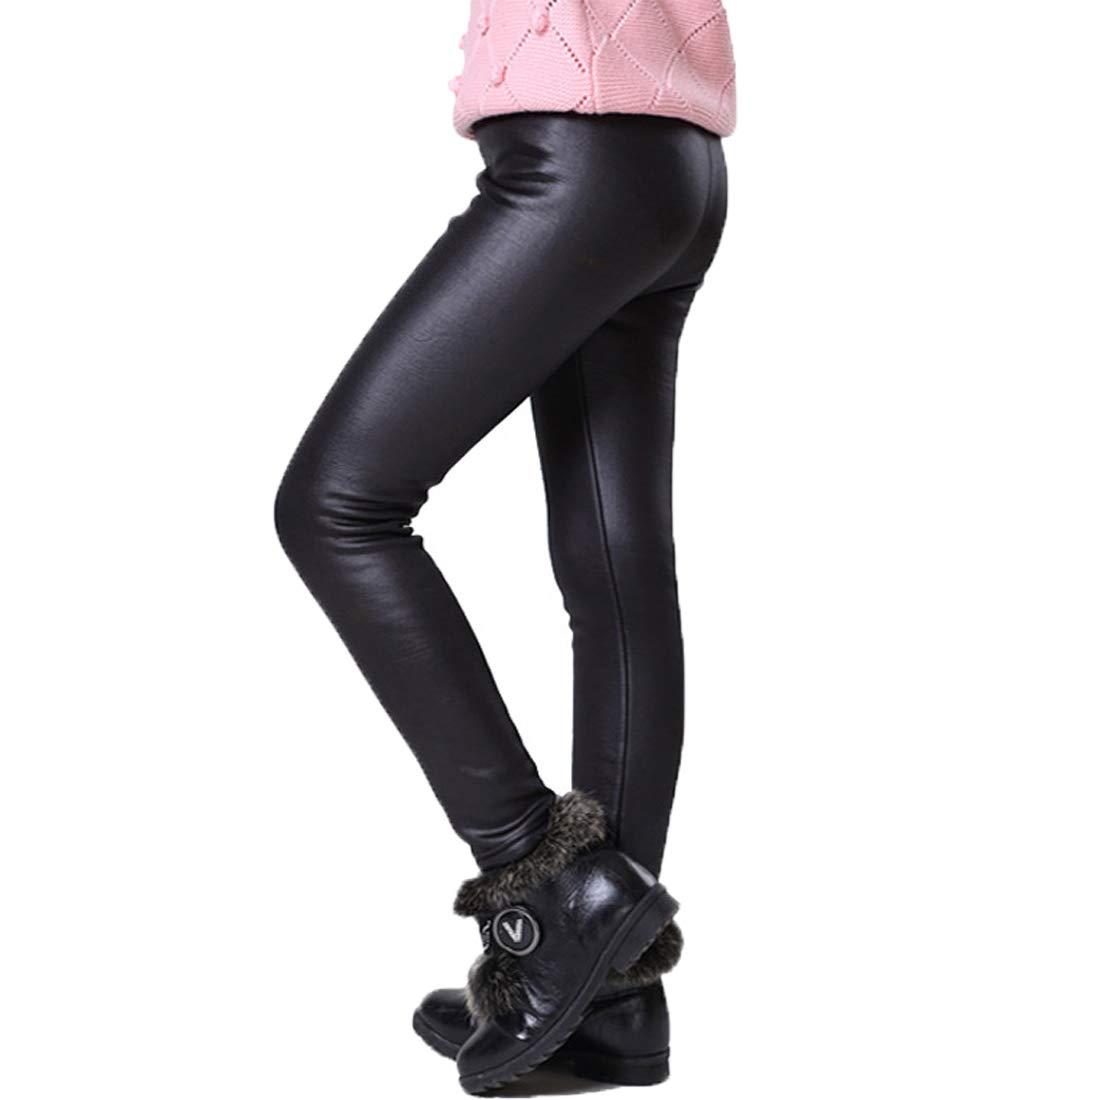 Weigou Girls Legging Pants Kids Thick Leggings Winter Warm Velvet Faux Leather Leggings Trousers